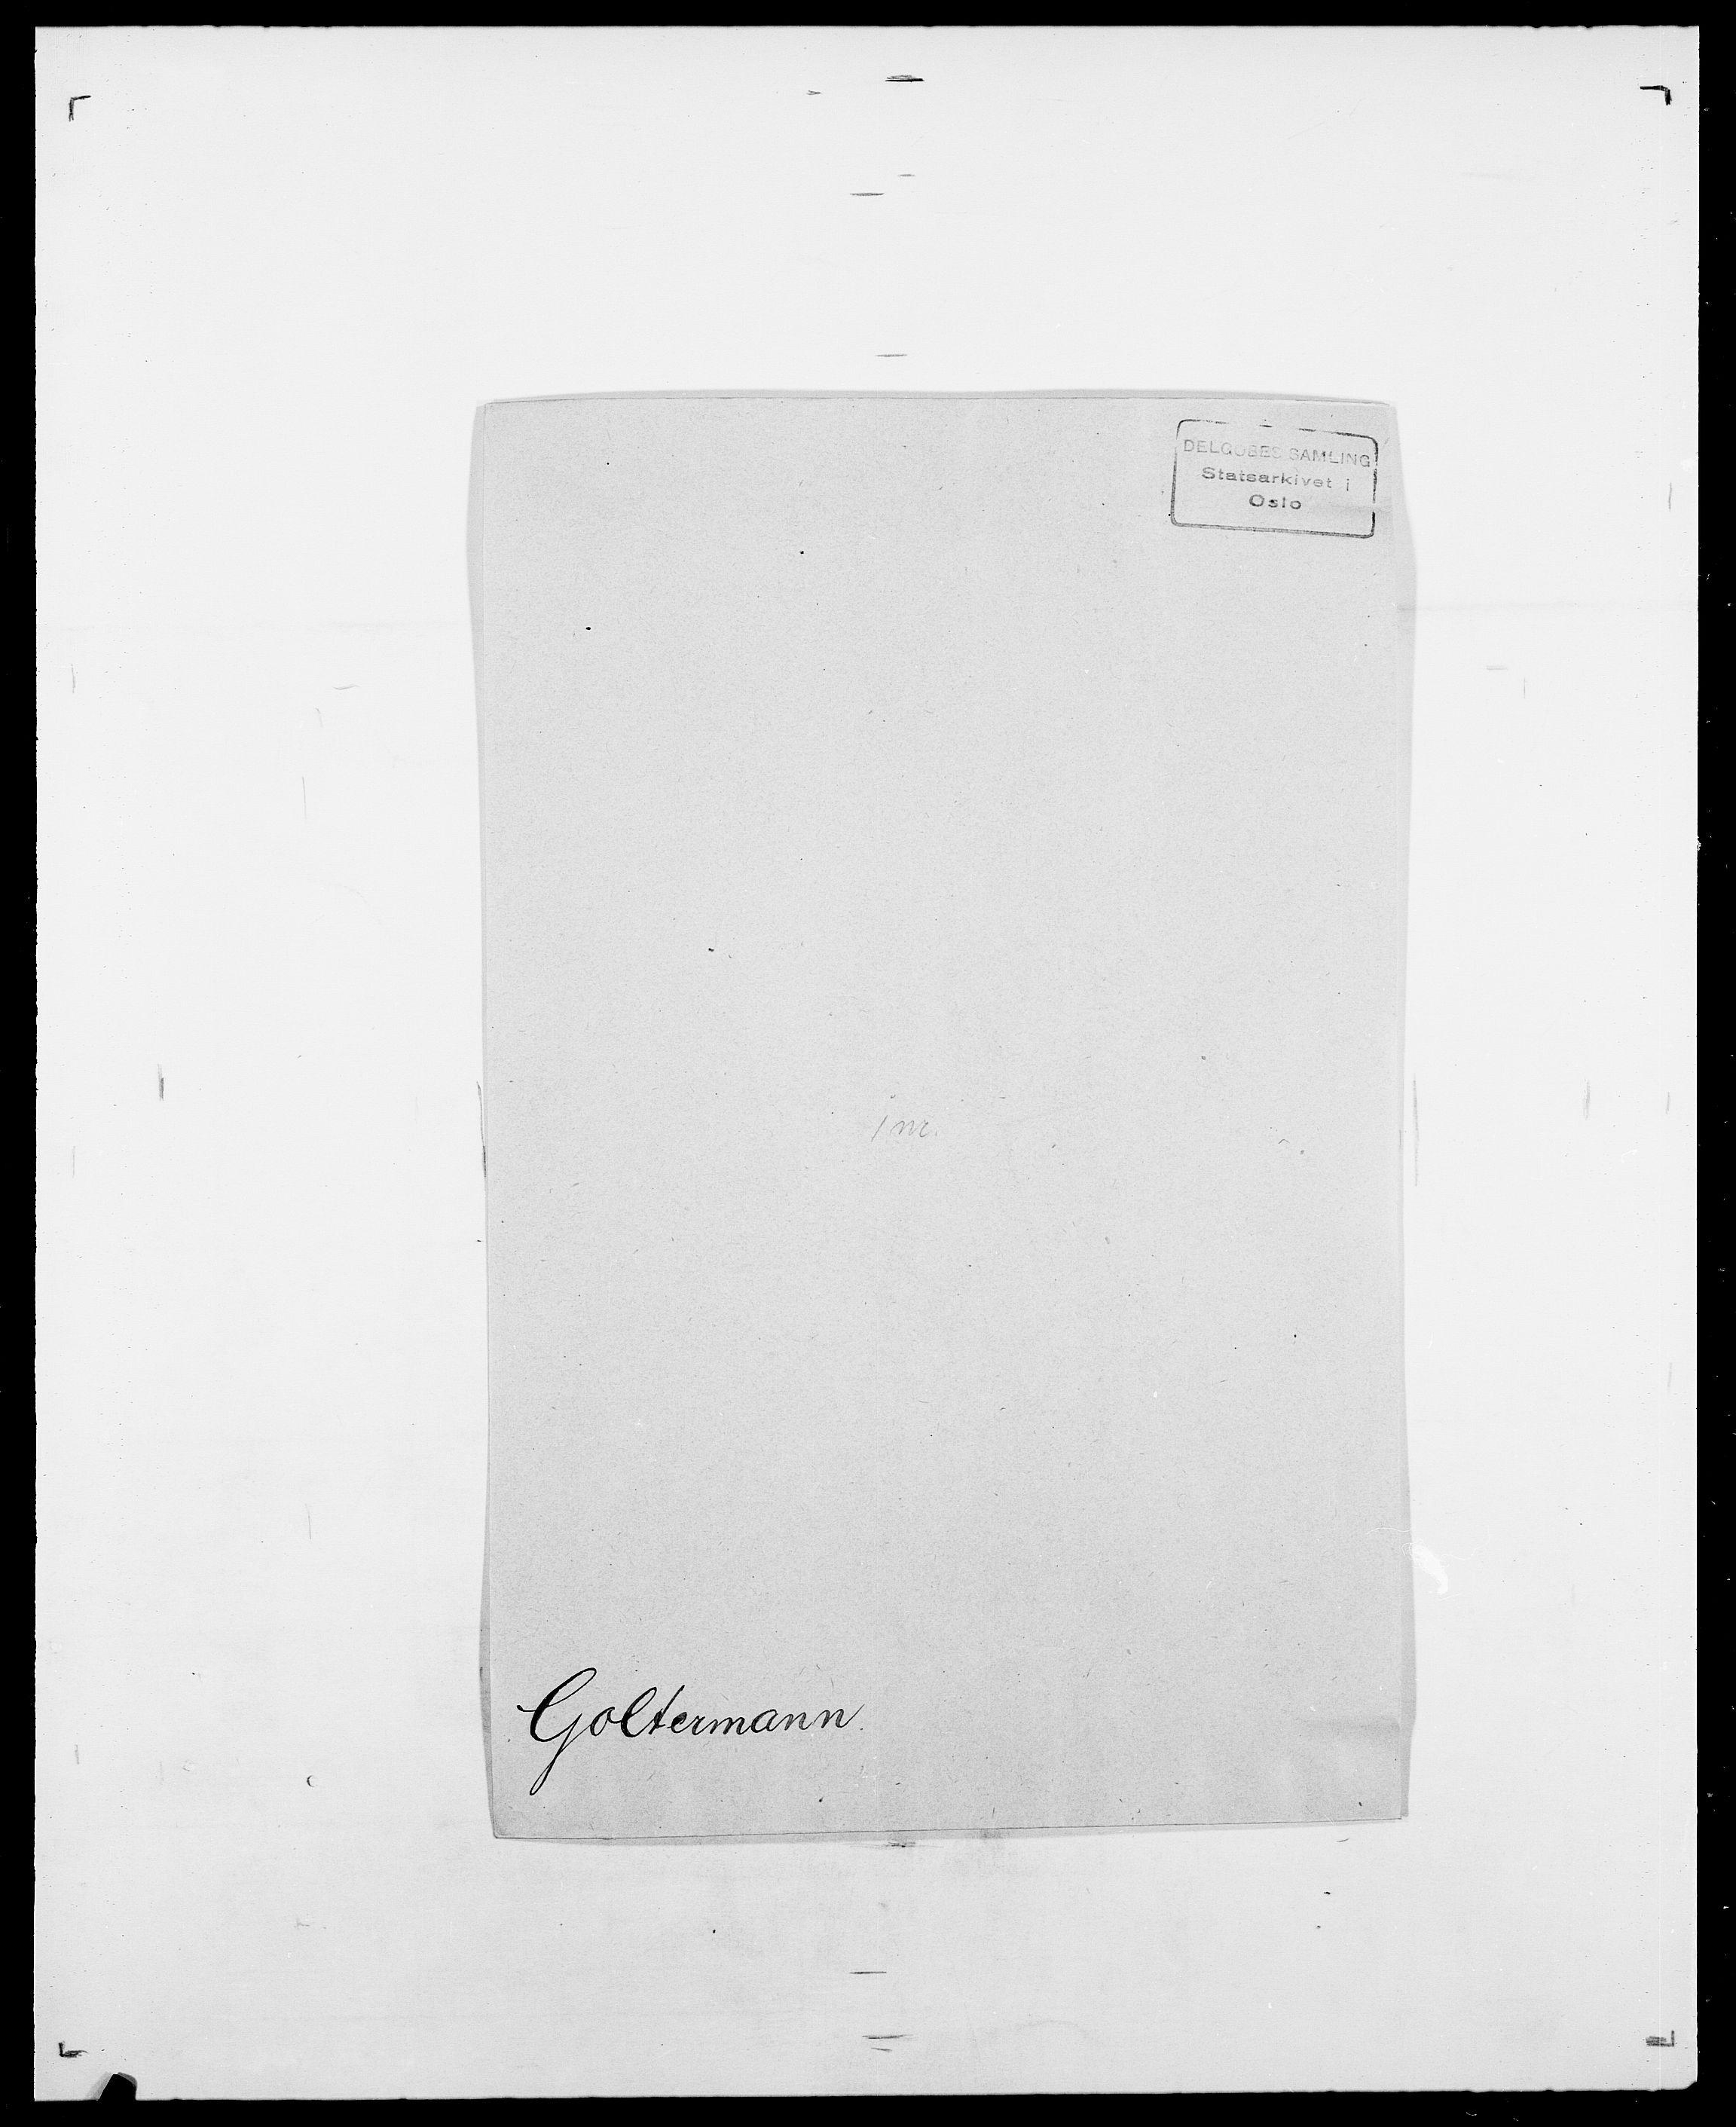 SAO, Delgobe, Charles Antoine - samling, D/Da/L0014: Giebdhausen - Grip, s. 371